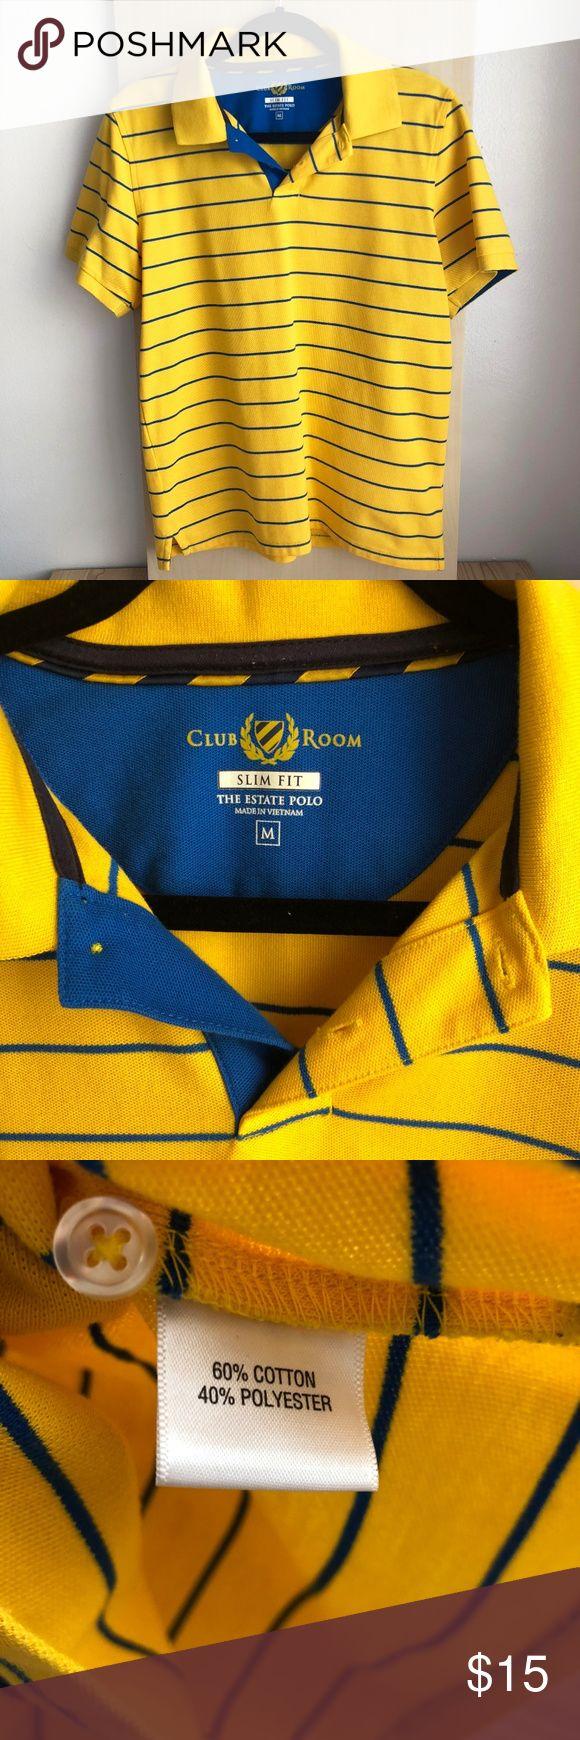 NWOT Herren Club Room Slim Fit The Estate Polo Farbe: Gelb, Blau Größe: M D …